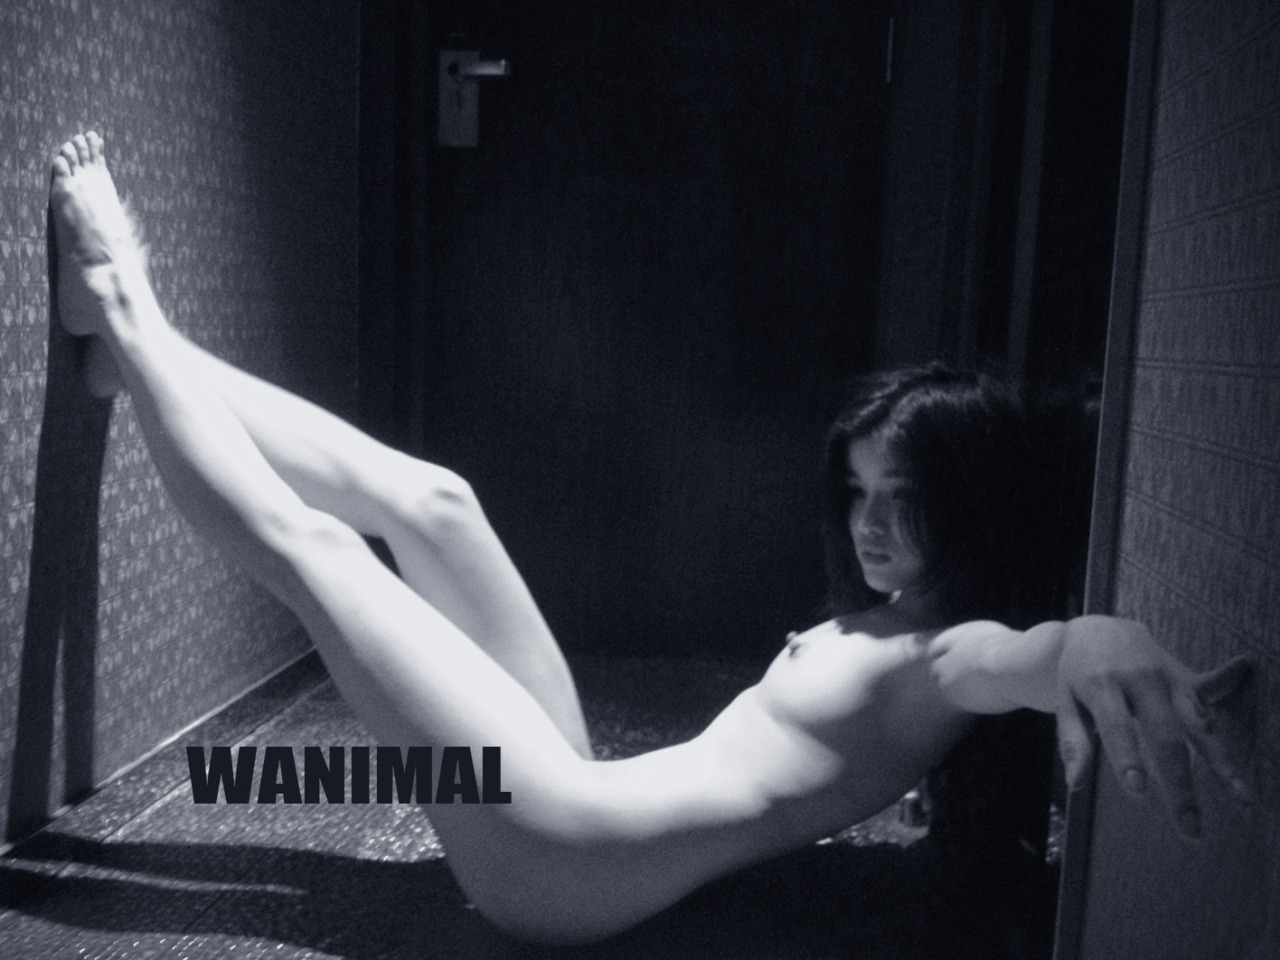 [WANIMAL王动] 2014年 作品 [50P]第五期